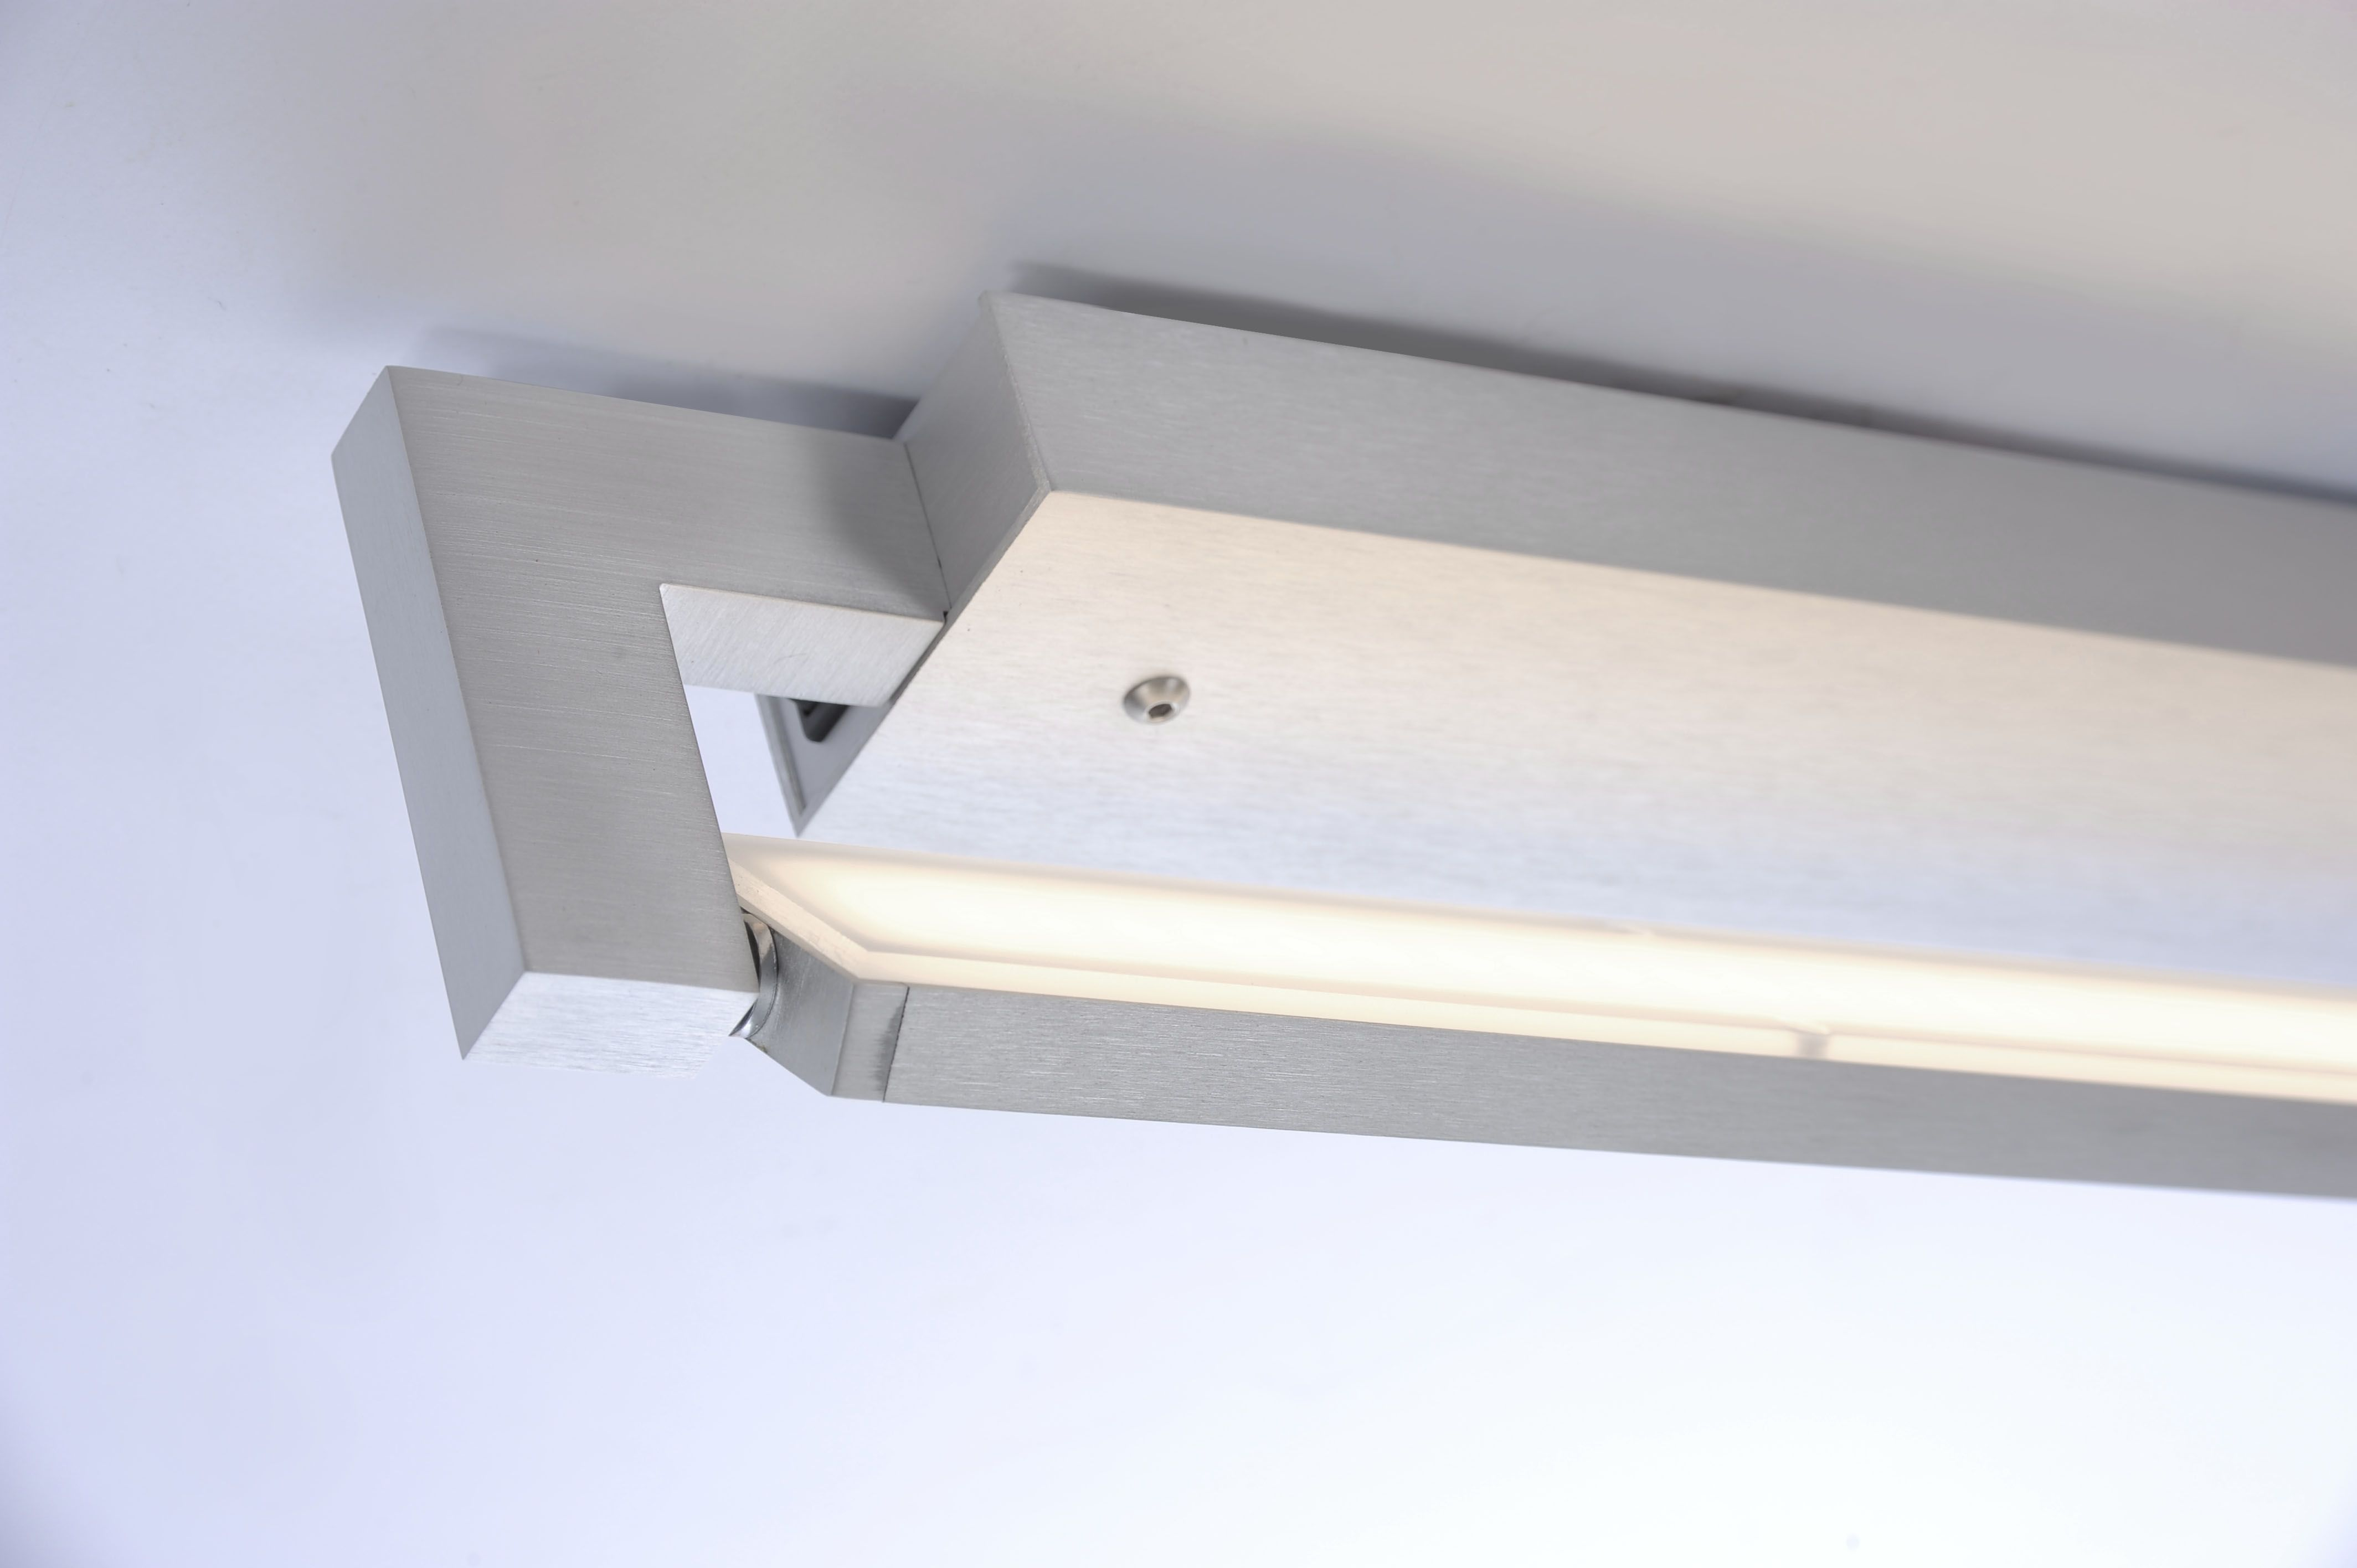 Q-MATTEO LED Deckenleuchte, Smart Home, aluminiumfarben, verstellbar